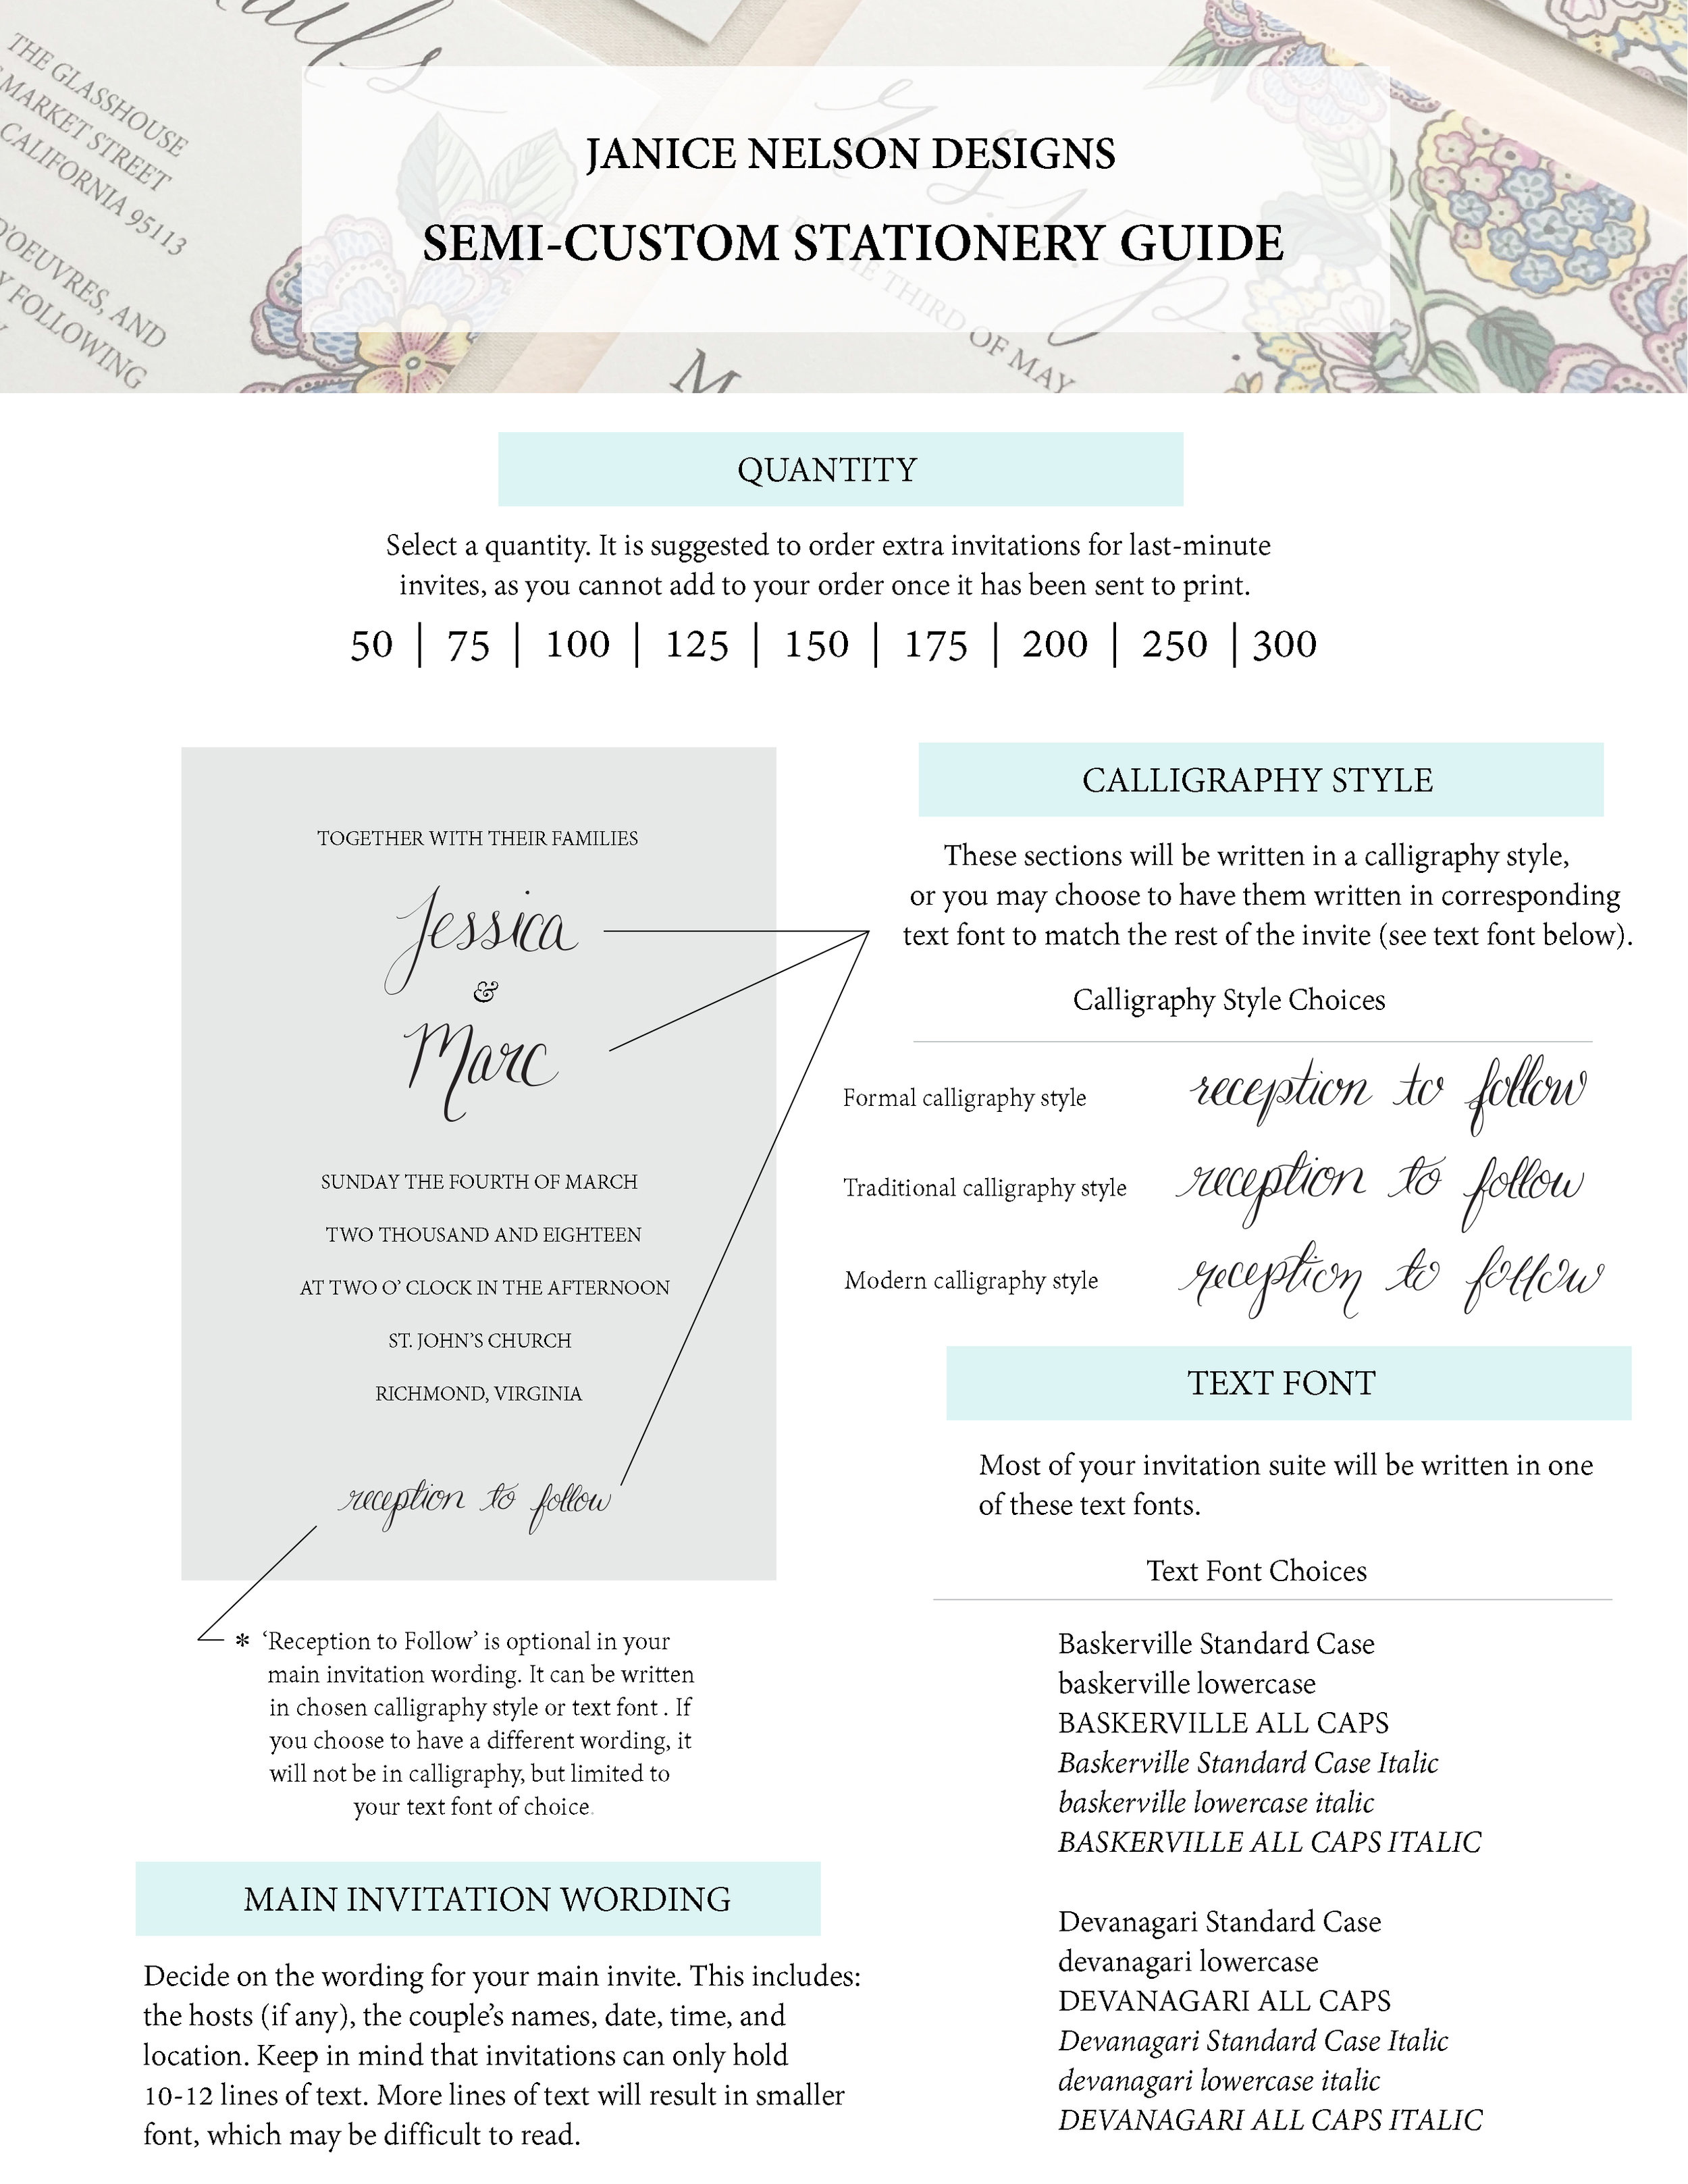 janice-nelson-semi-custom-stationery-guide.jpg